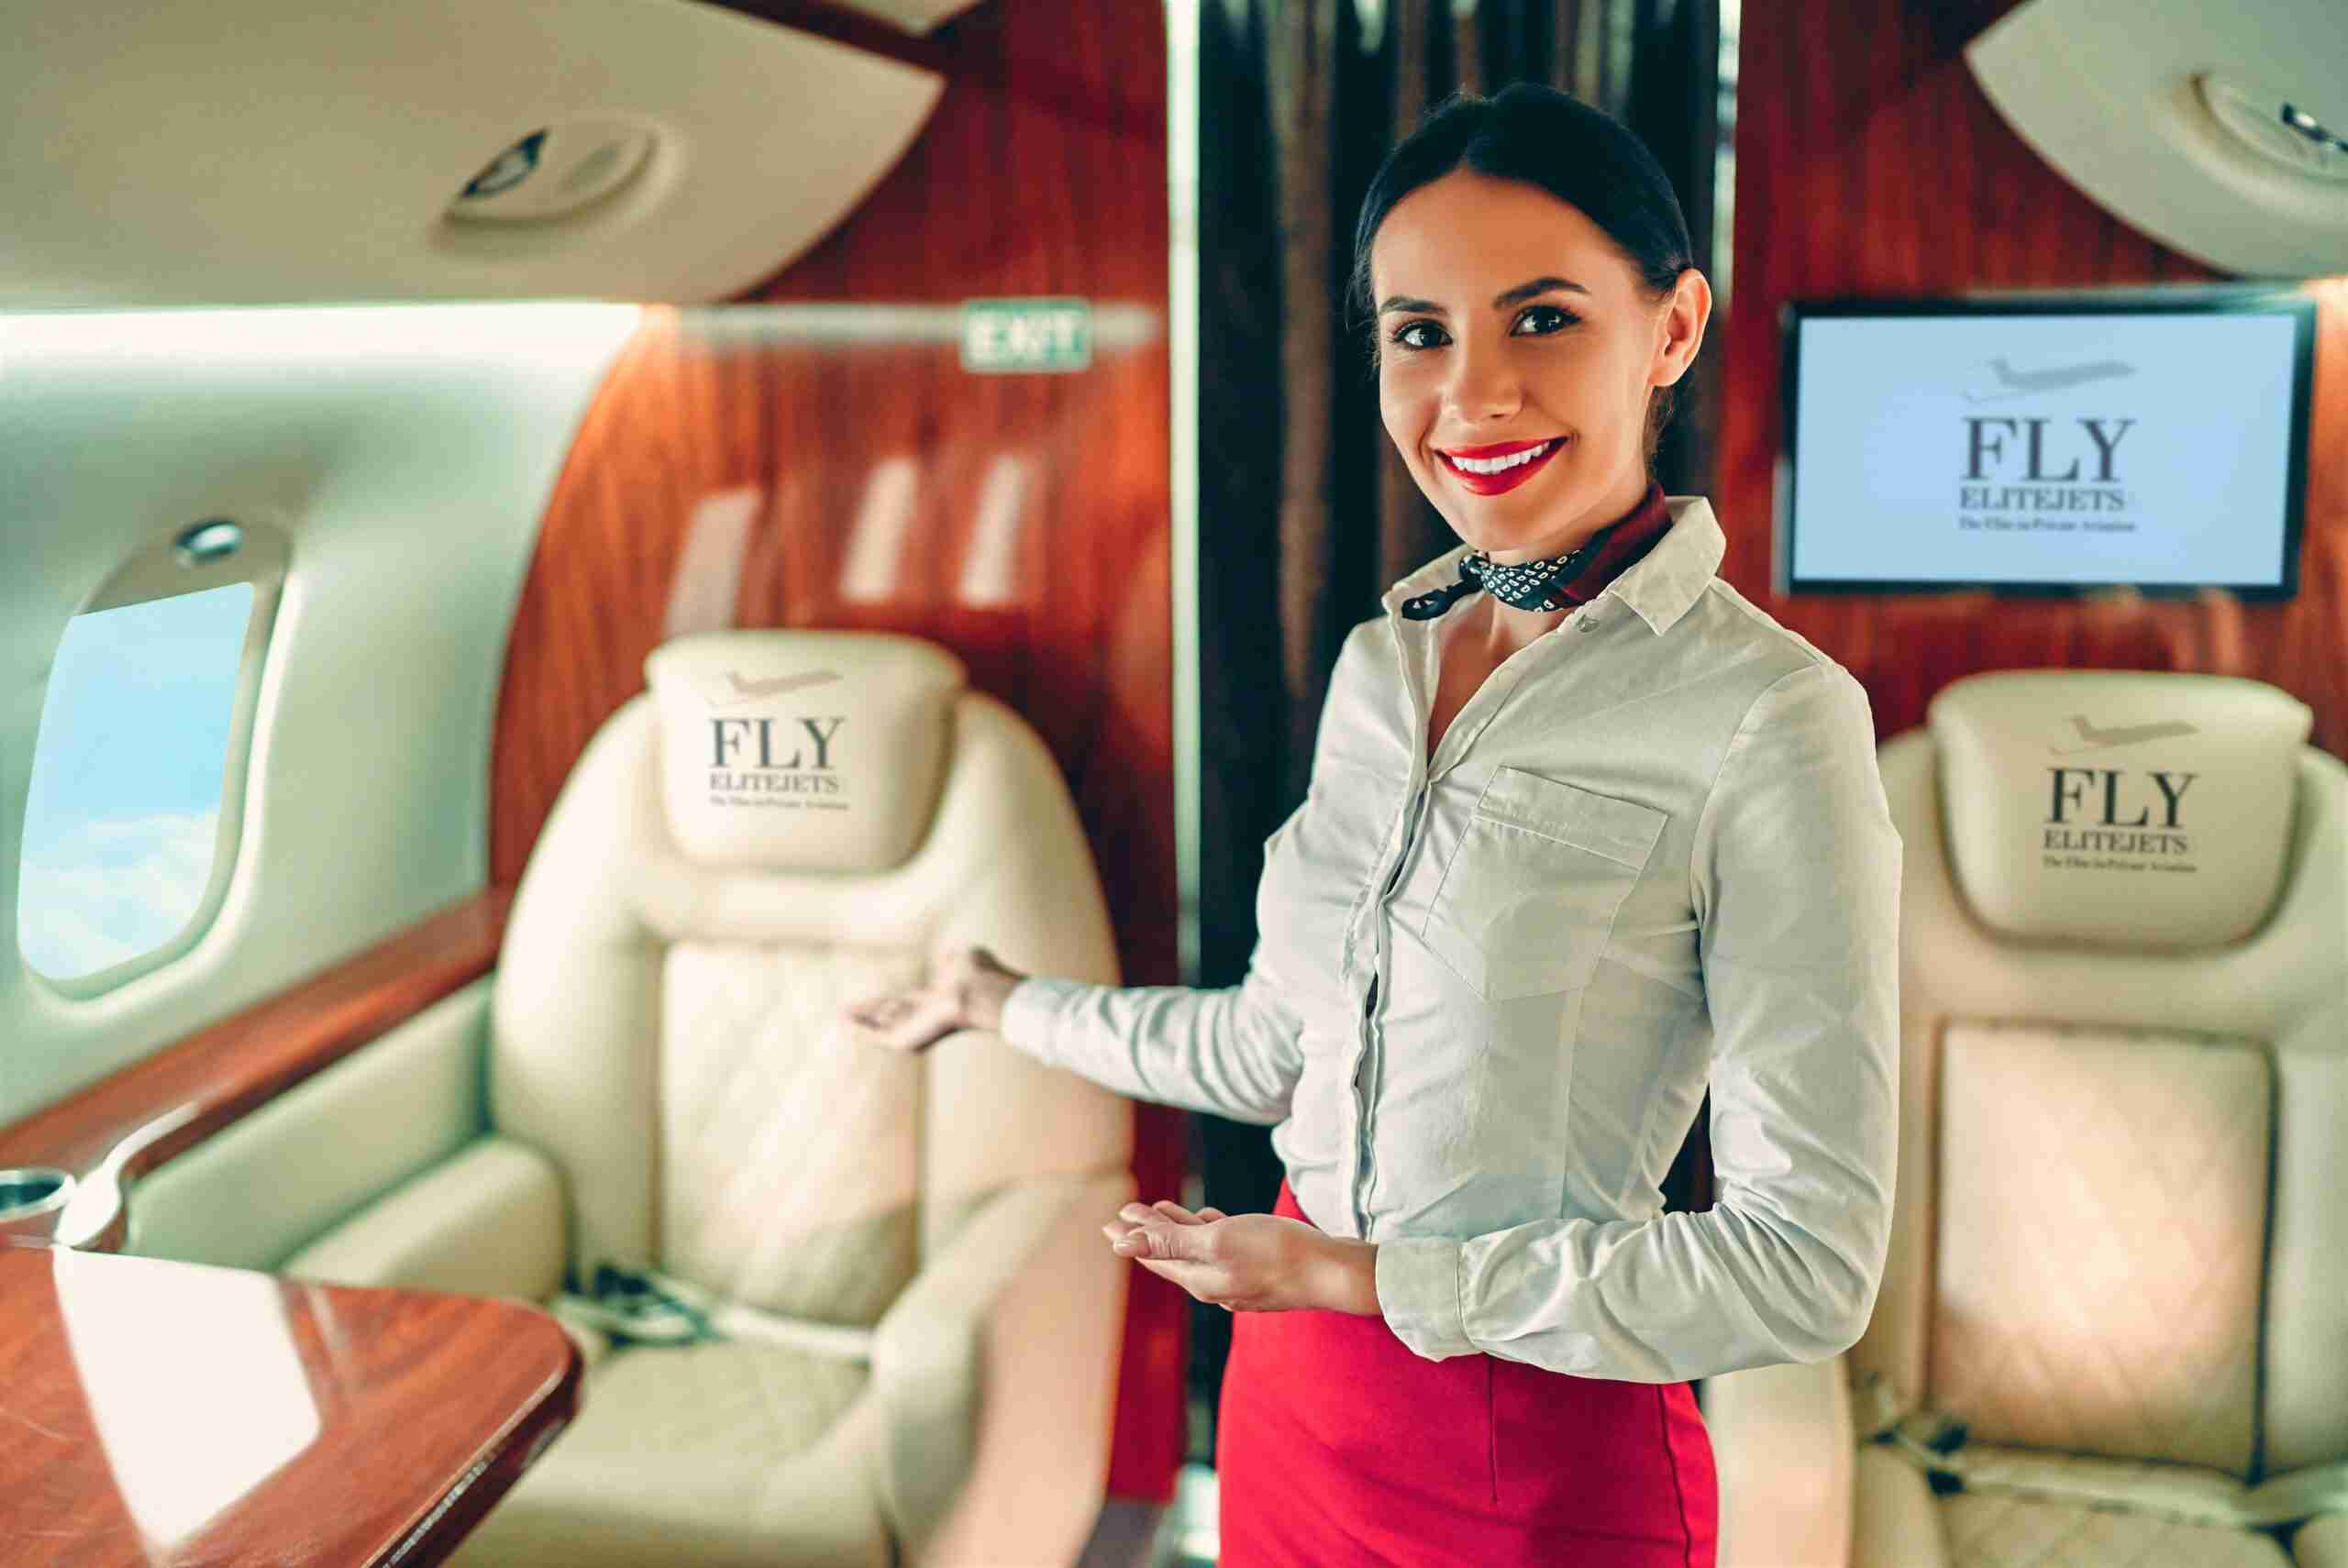 FlyEliteJets stewardess welcome